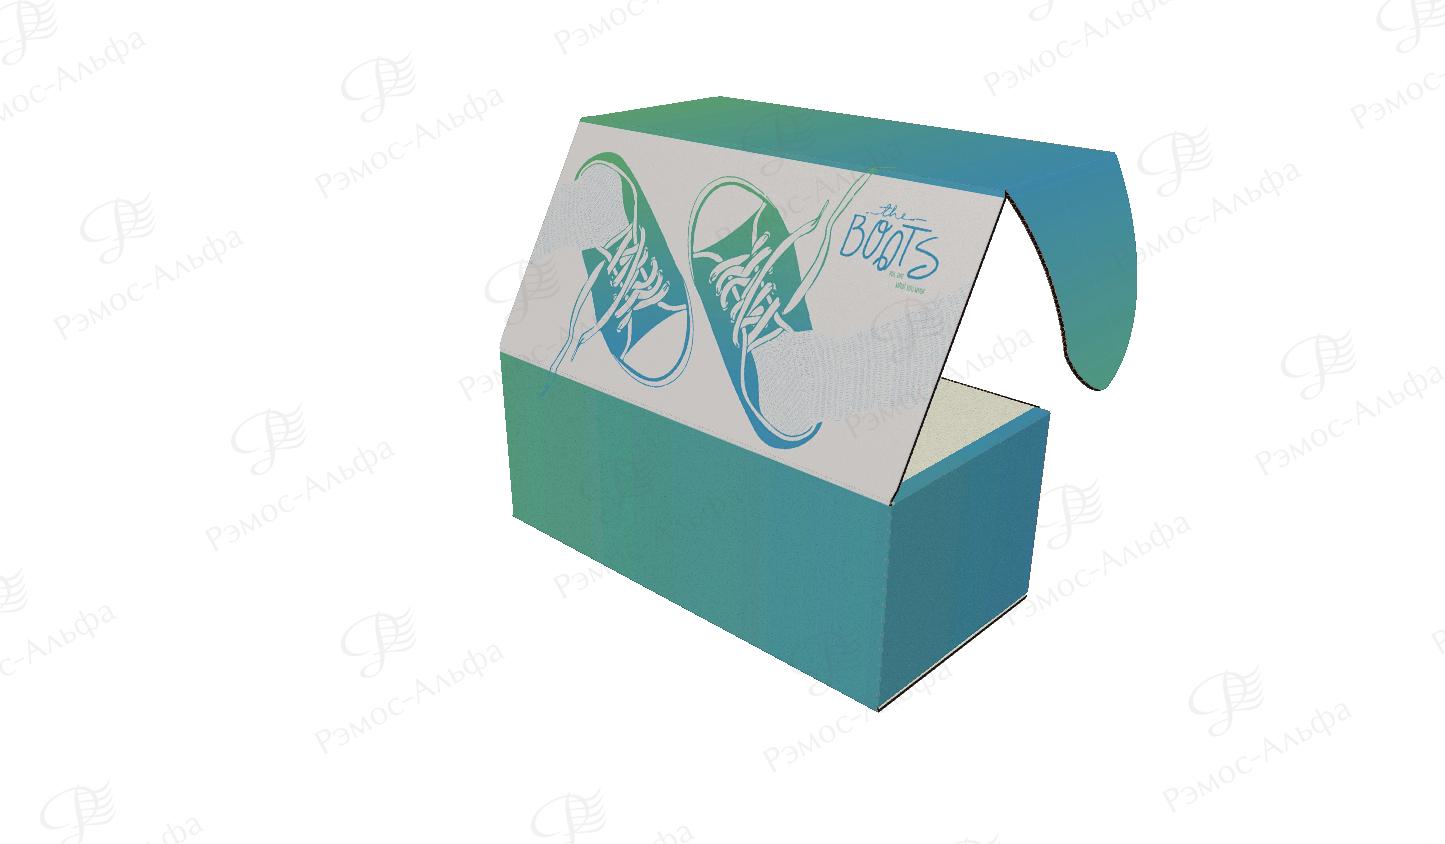 обувь_1194_3.jpg